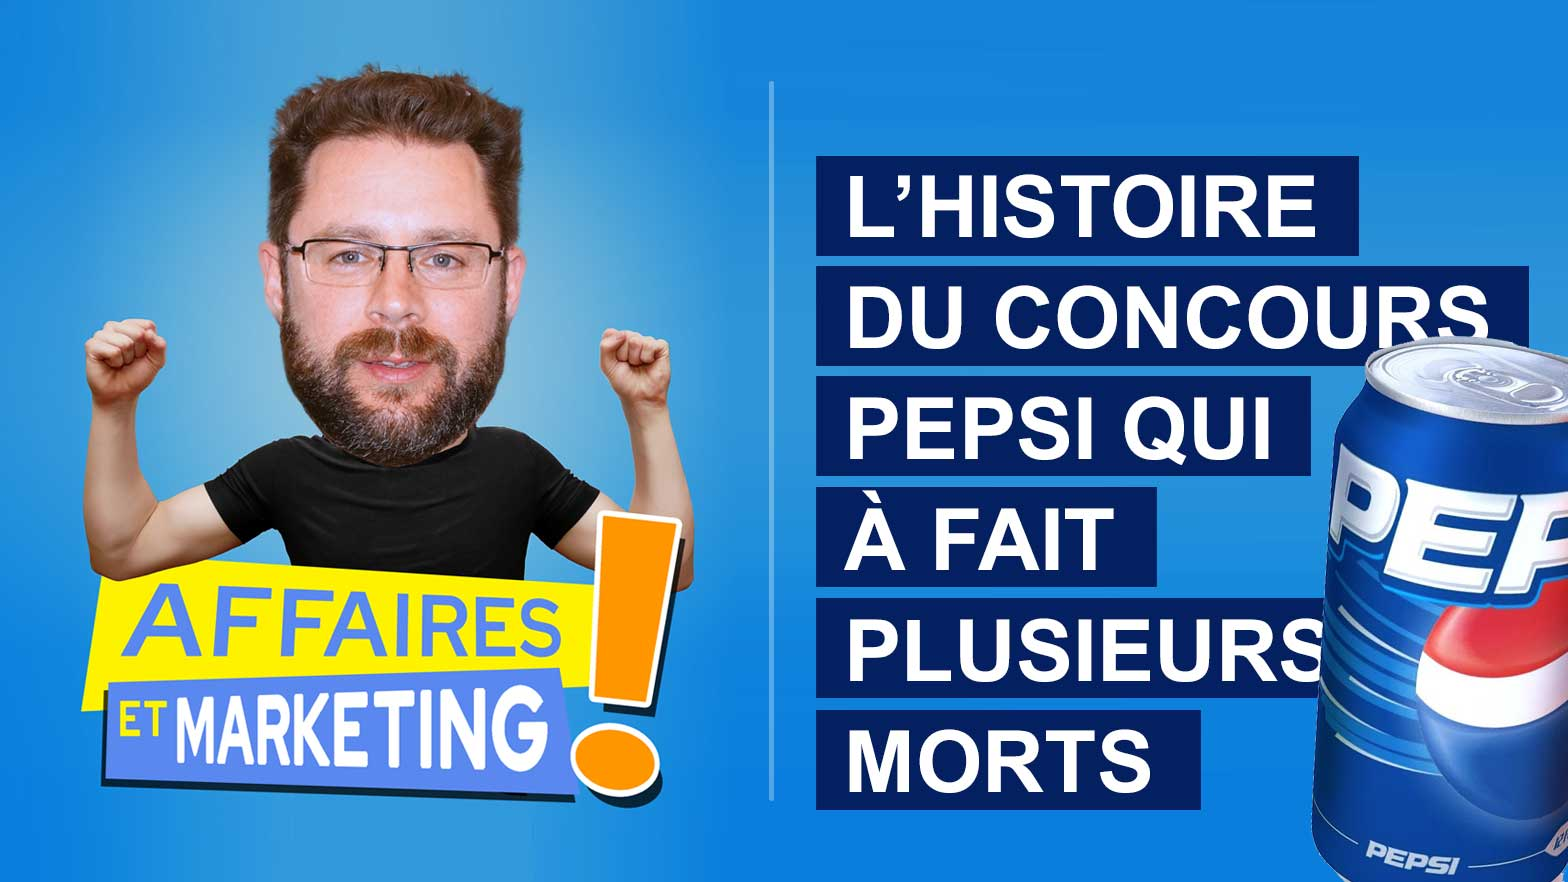 You are currently viewing Podcast | E19: L'histoire du concours Pepsi qui a fait plusieurs morts